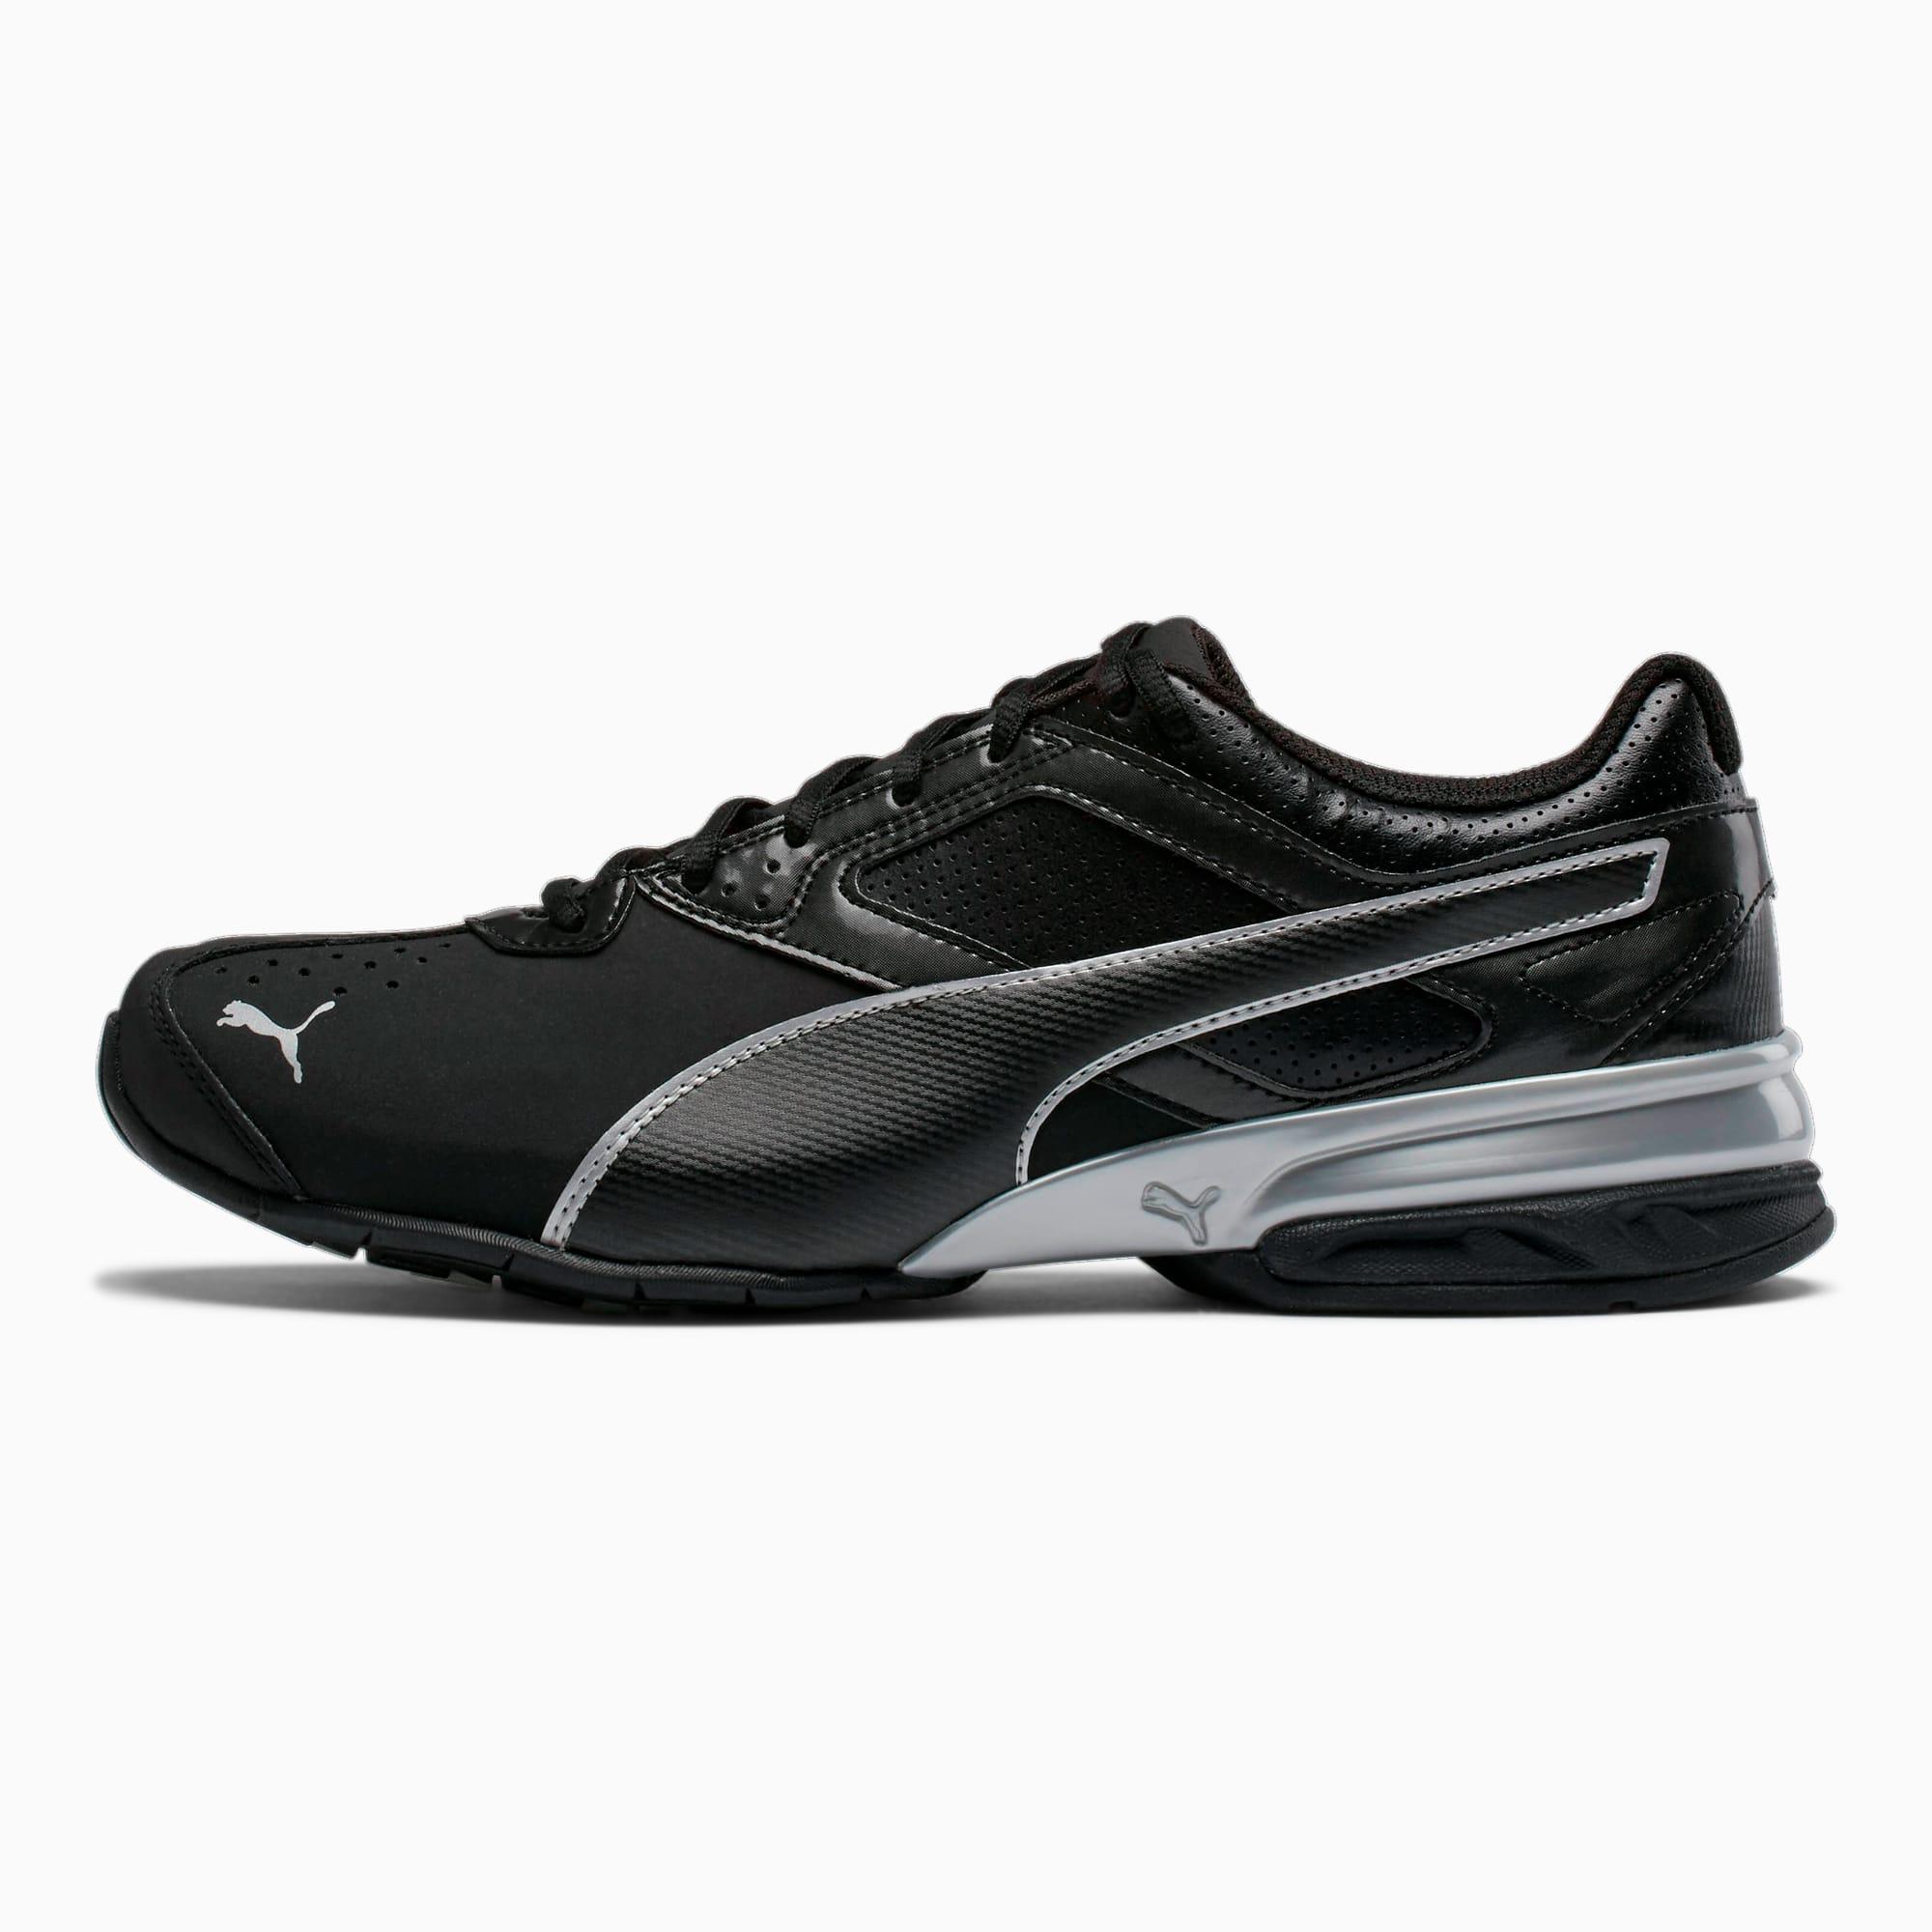 Puma Tazon 6 FM Black Silver Zapatillas de Running para Hombre